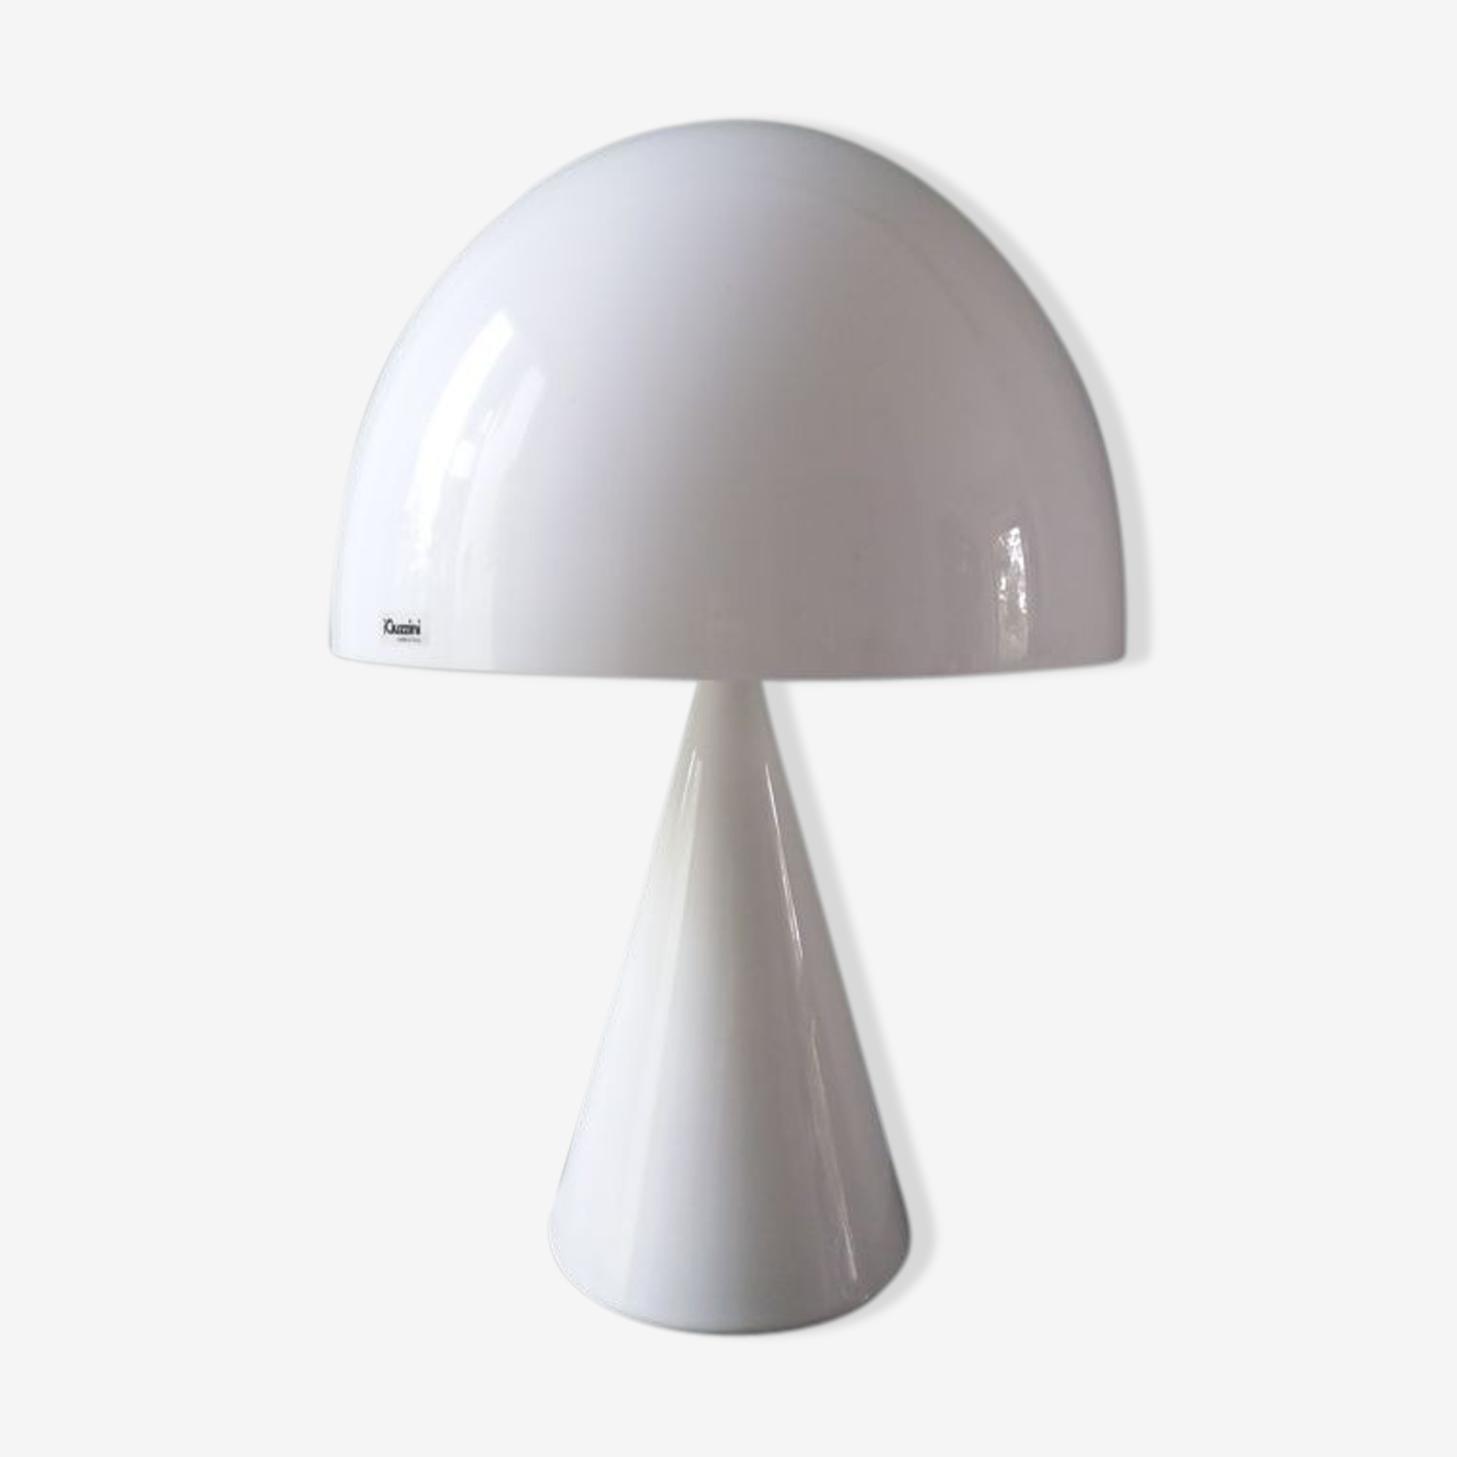 Lamp Guzzini - Baobab - 70 years